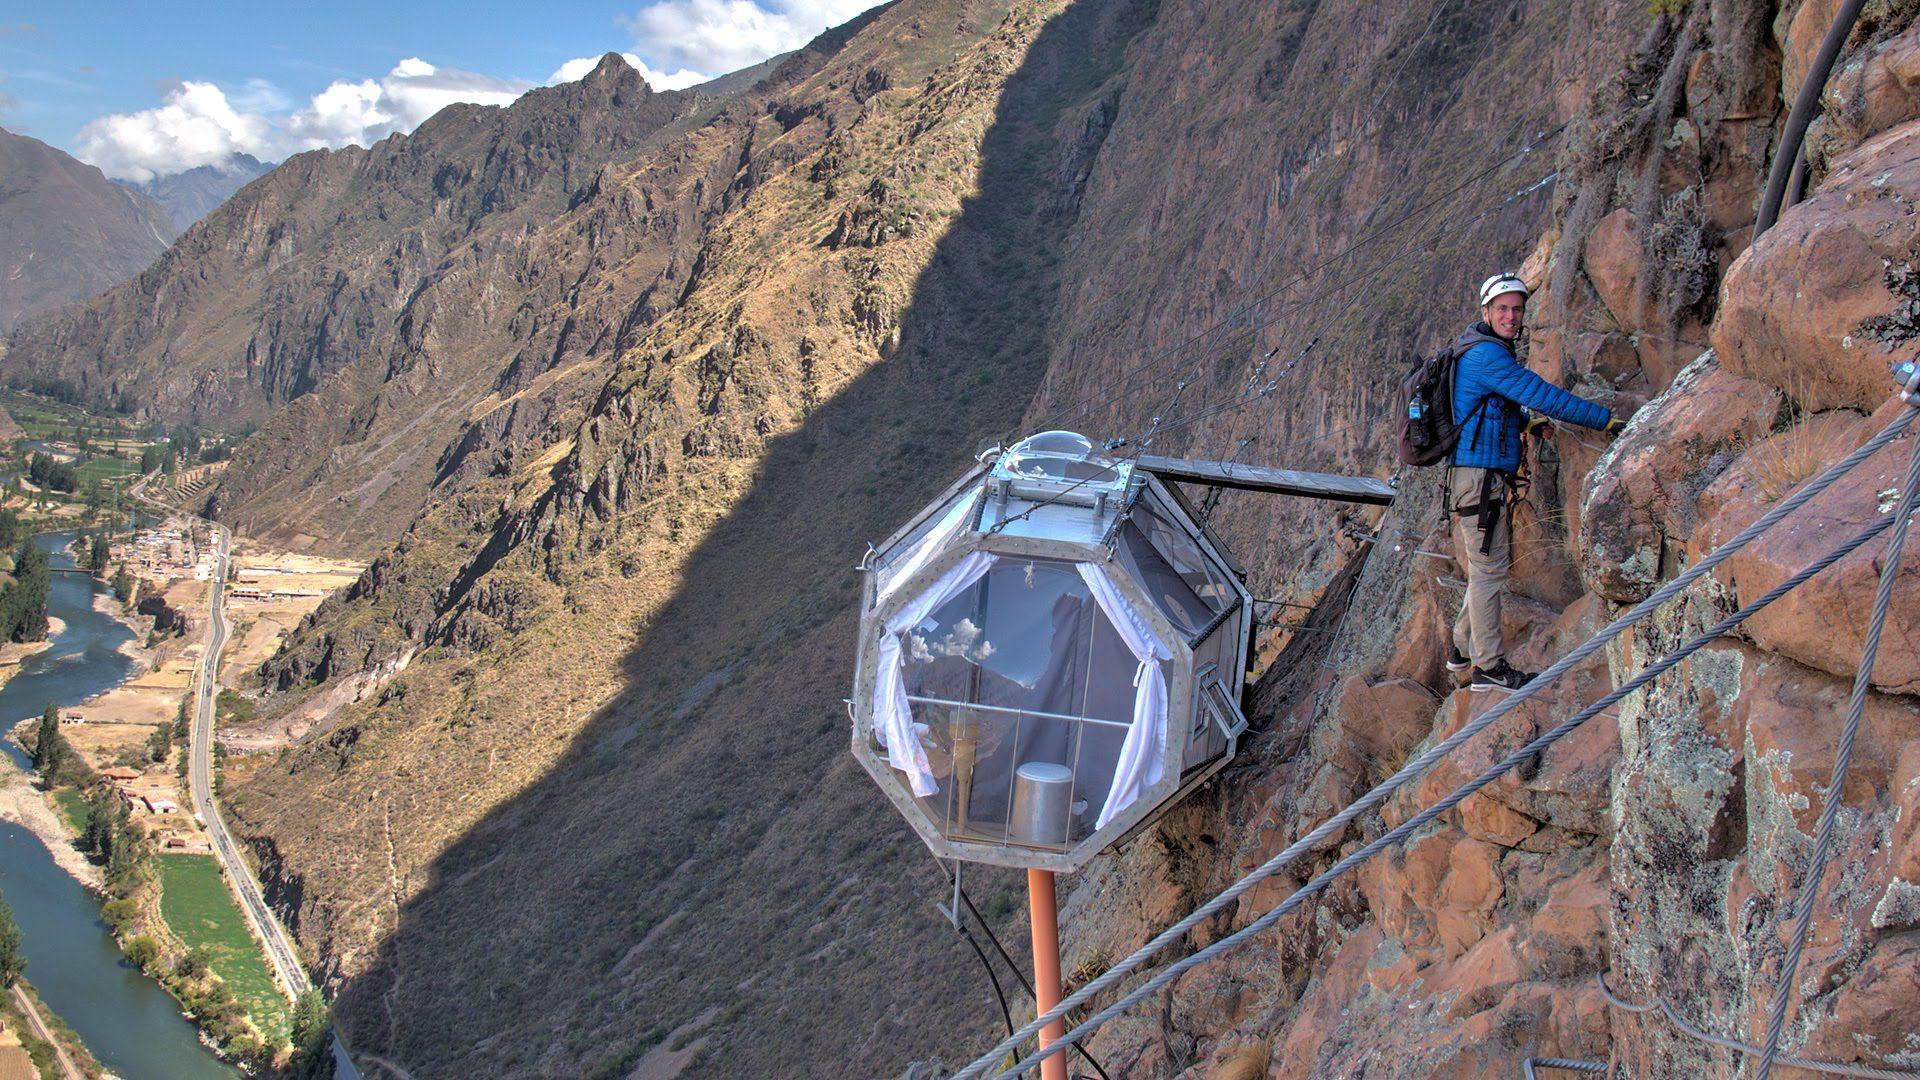 Skylodge - Coolest Hotel In World Peru